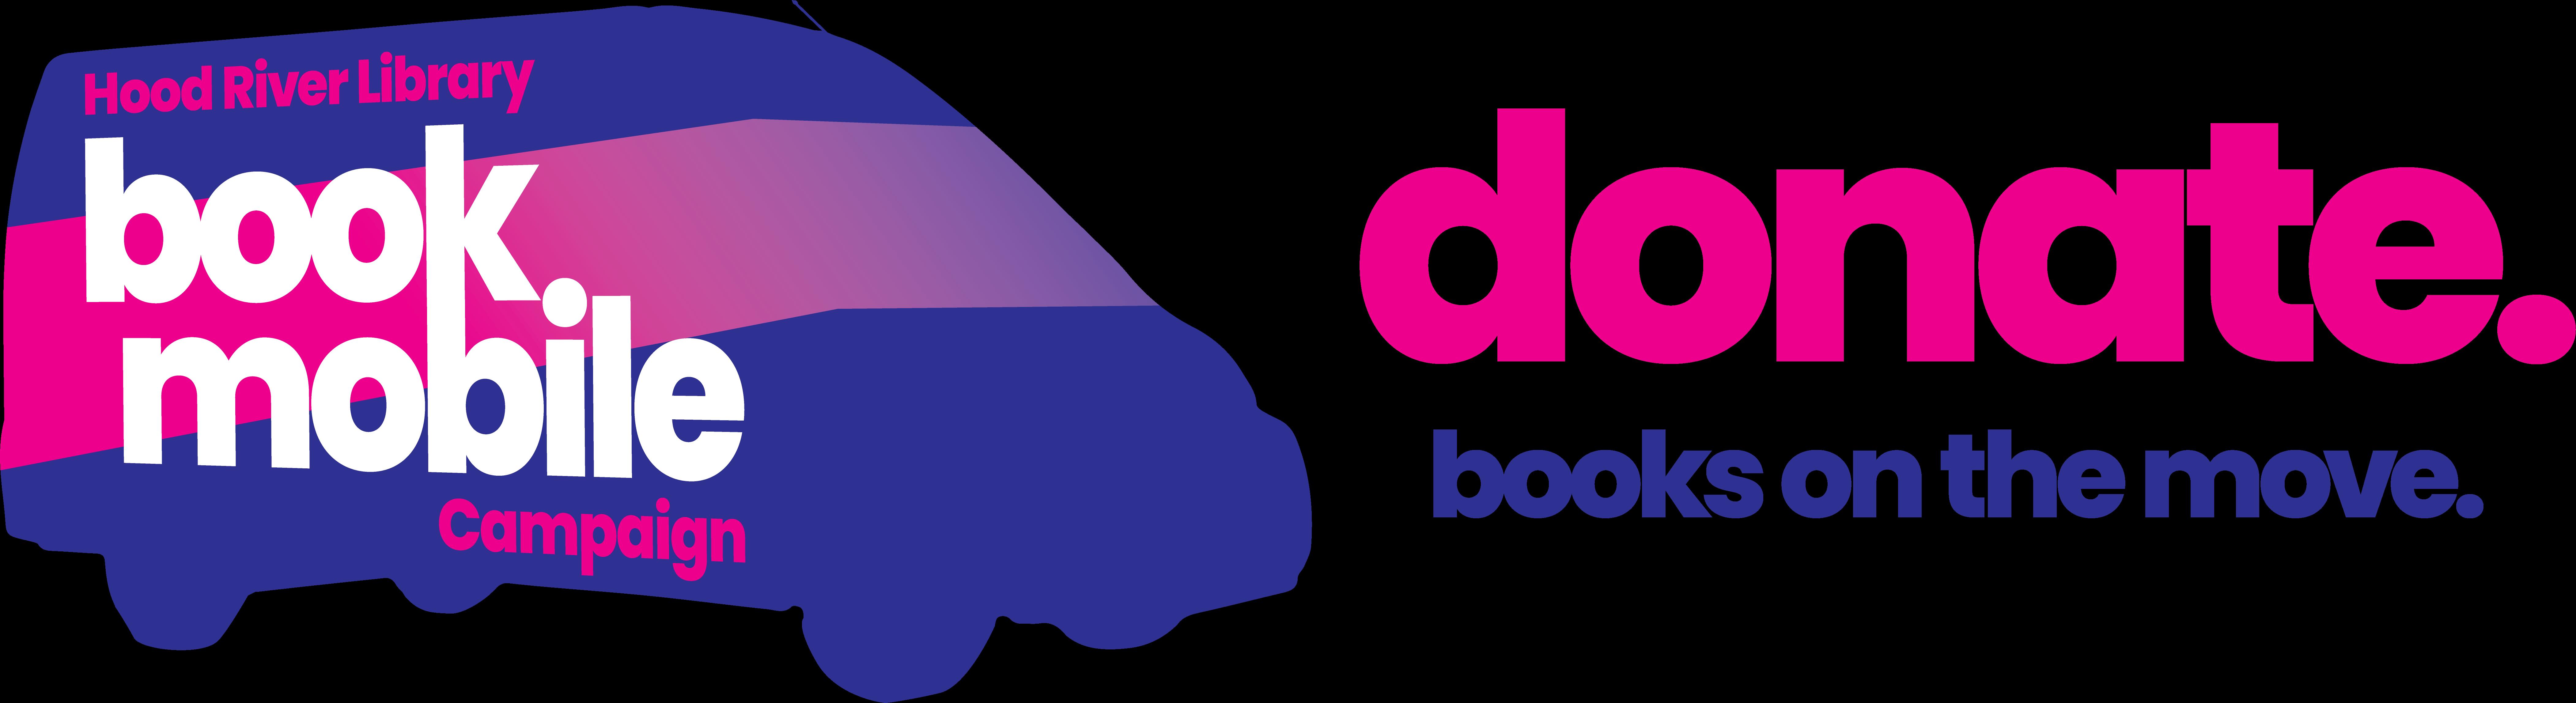 Bookmobile Donations